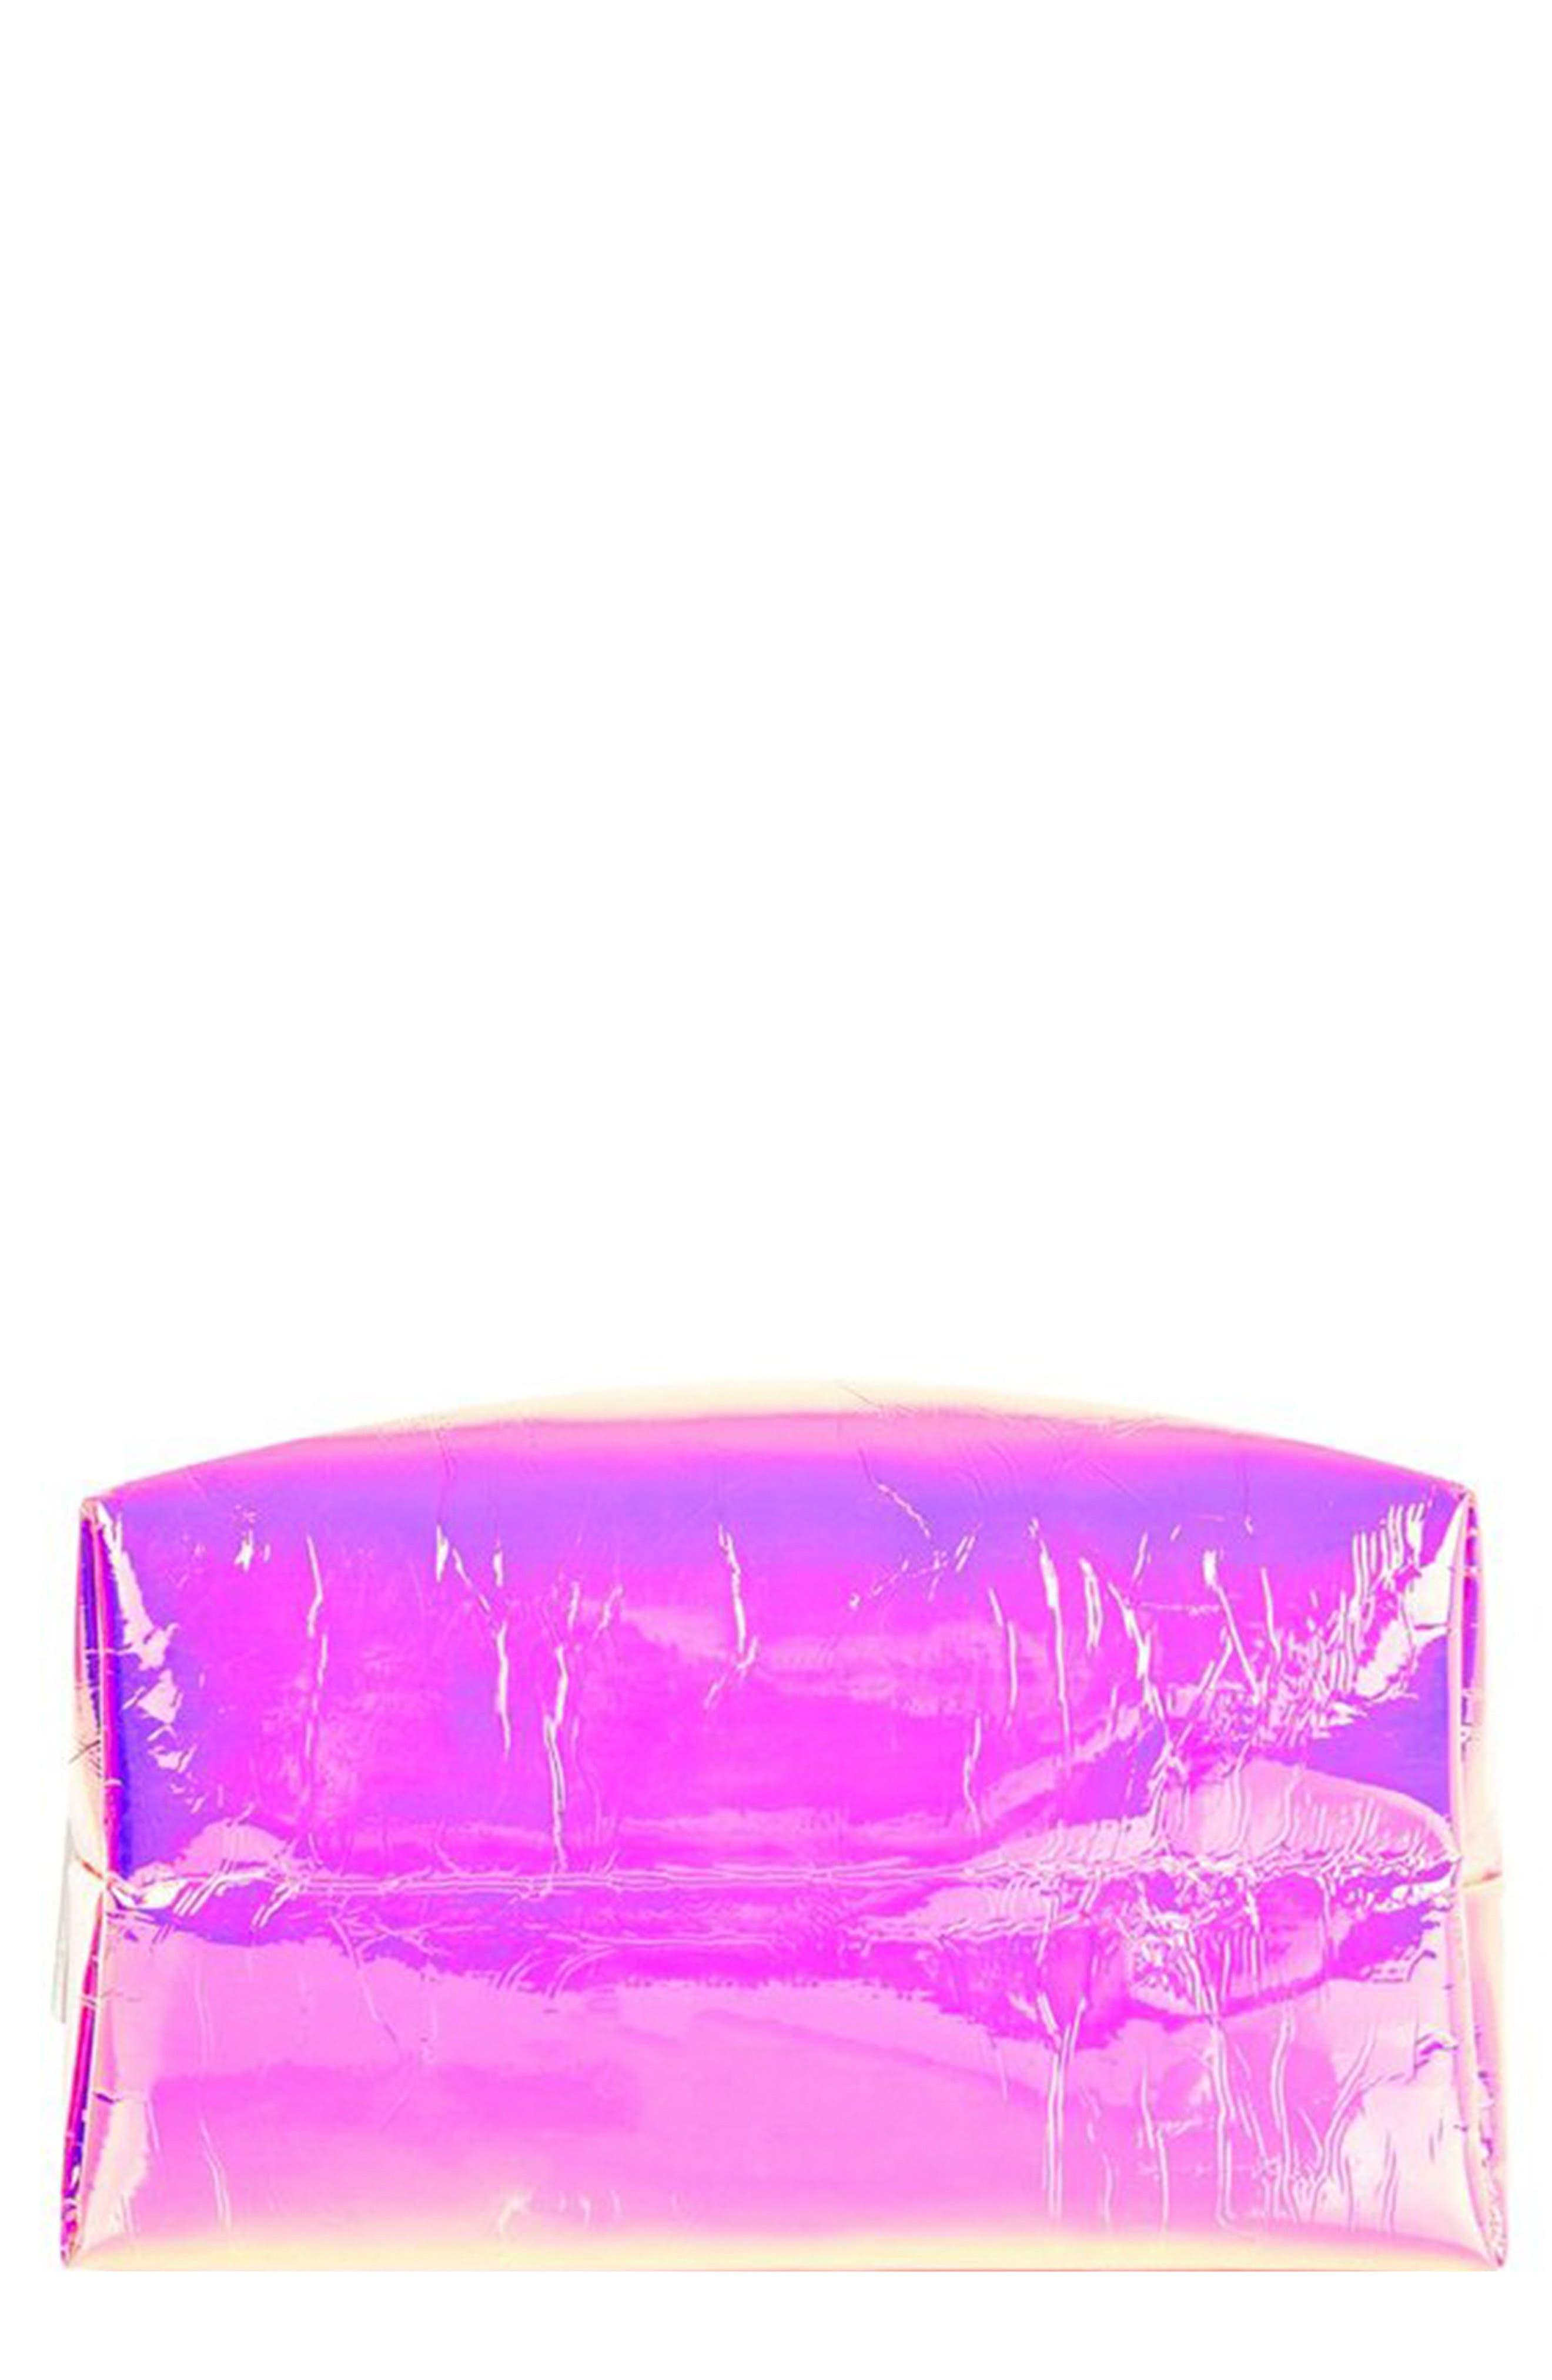 Skinny Dip Pink Hologram Makeup Bag,                             Main thumbnail 1, color,                             No Color